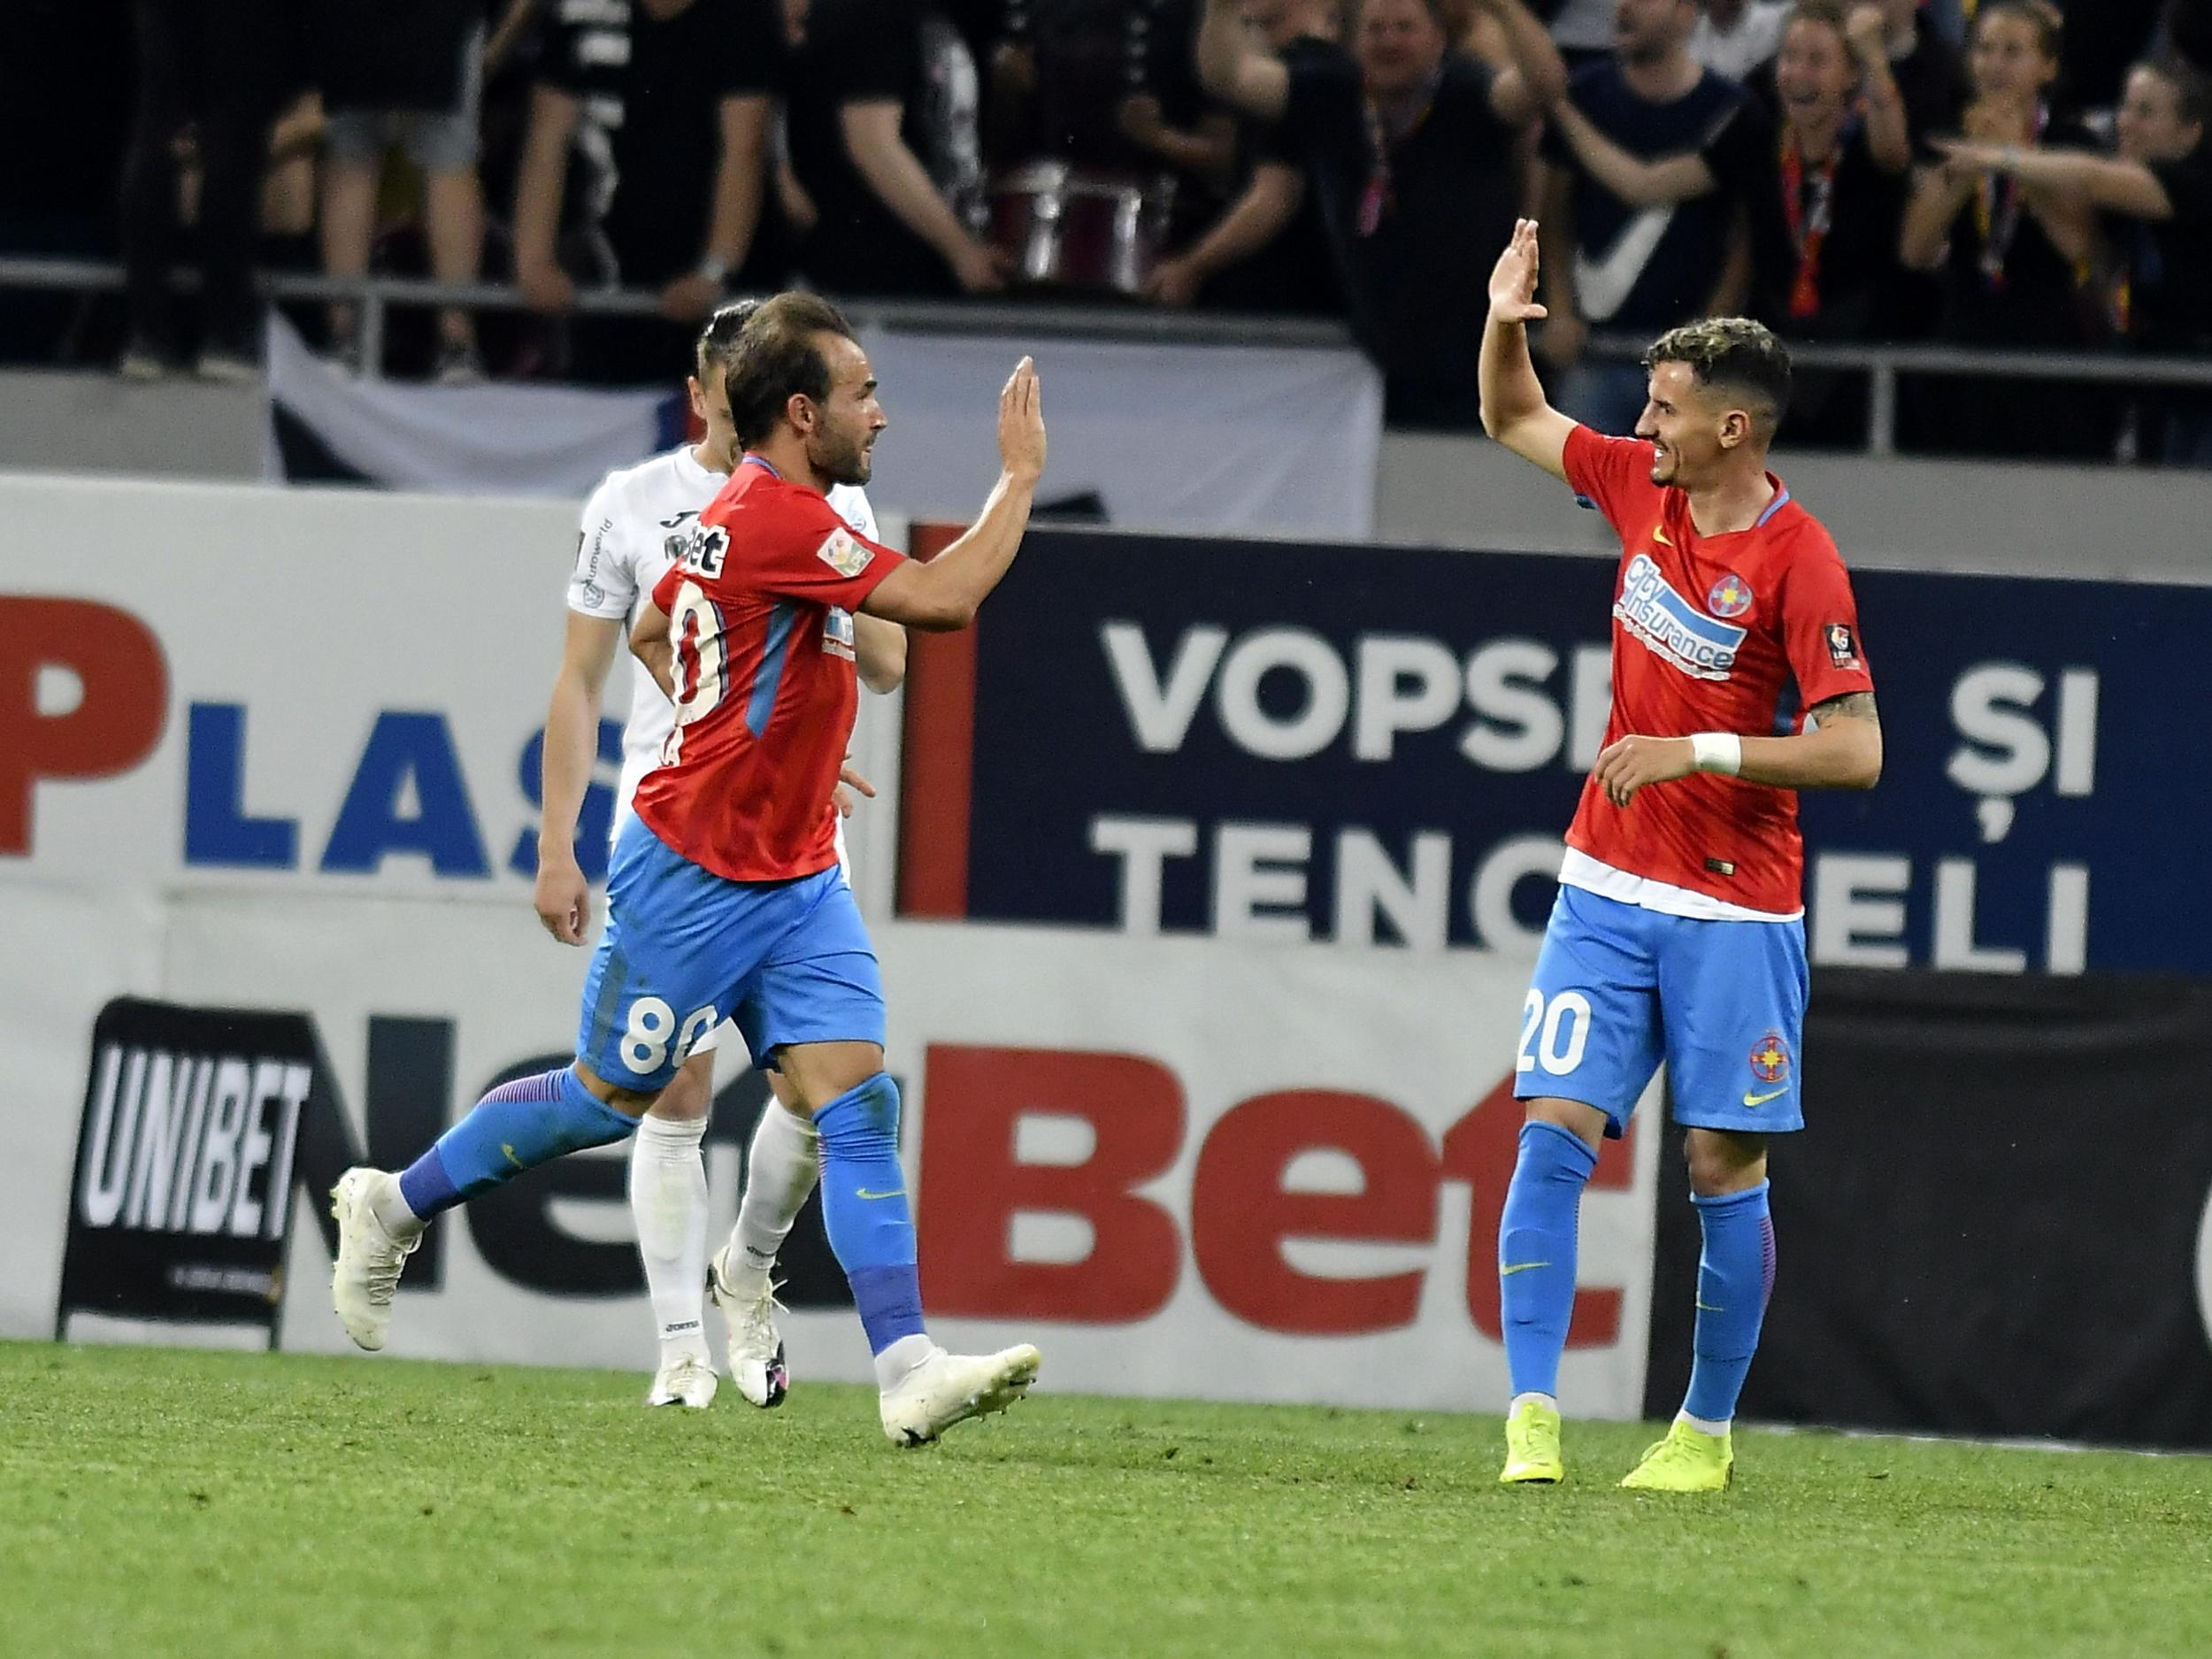 Victorie de final marca Filipe Teixeira!>